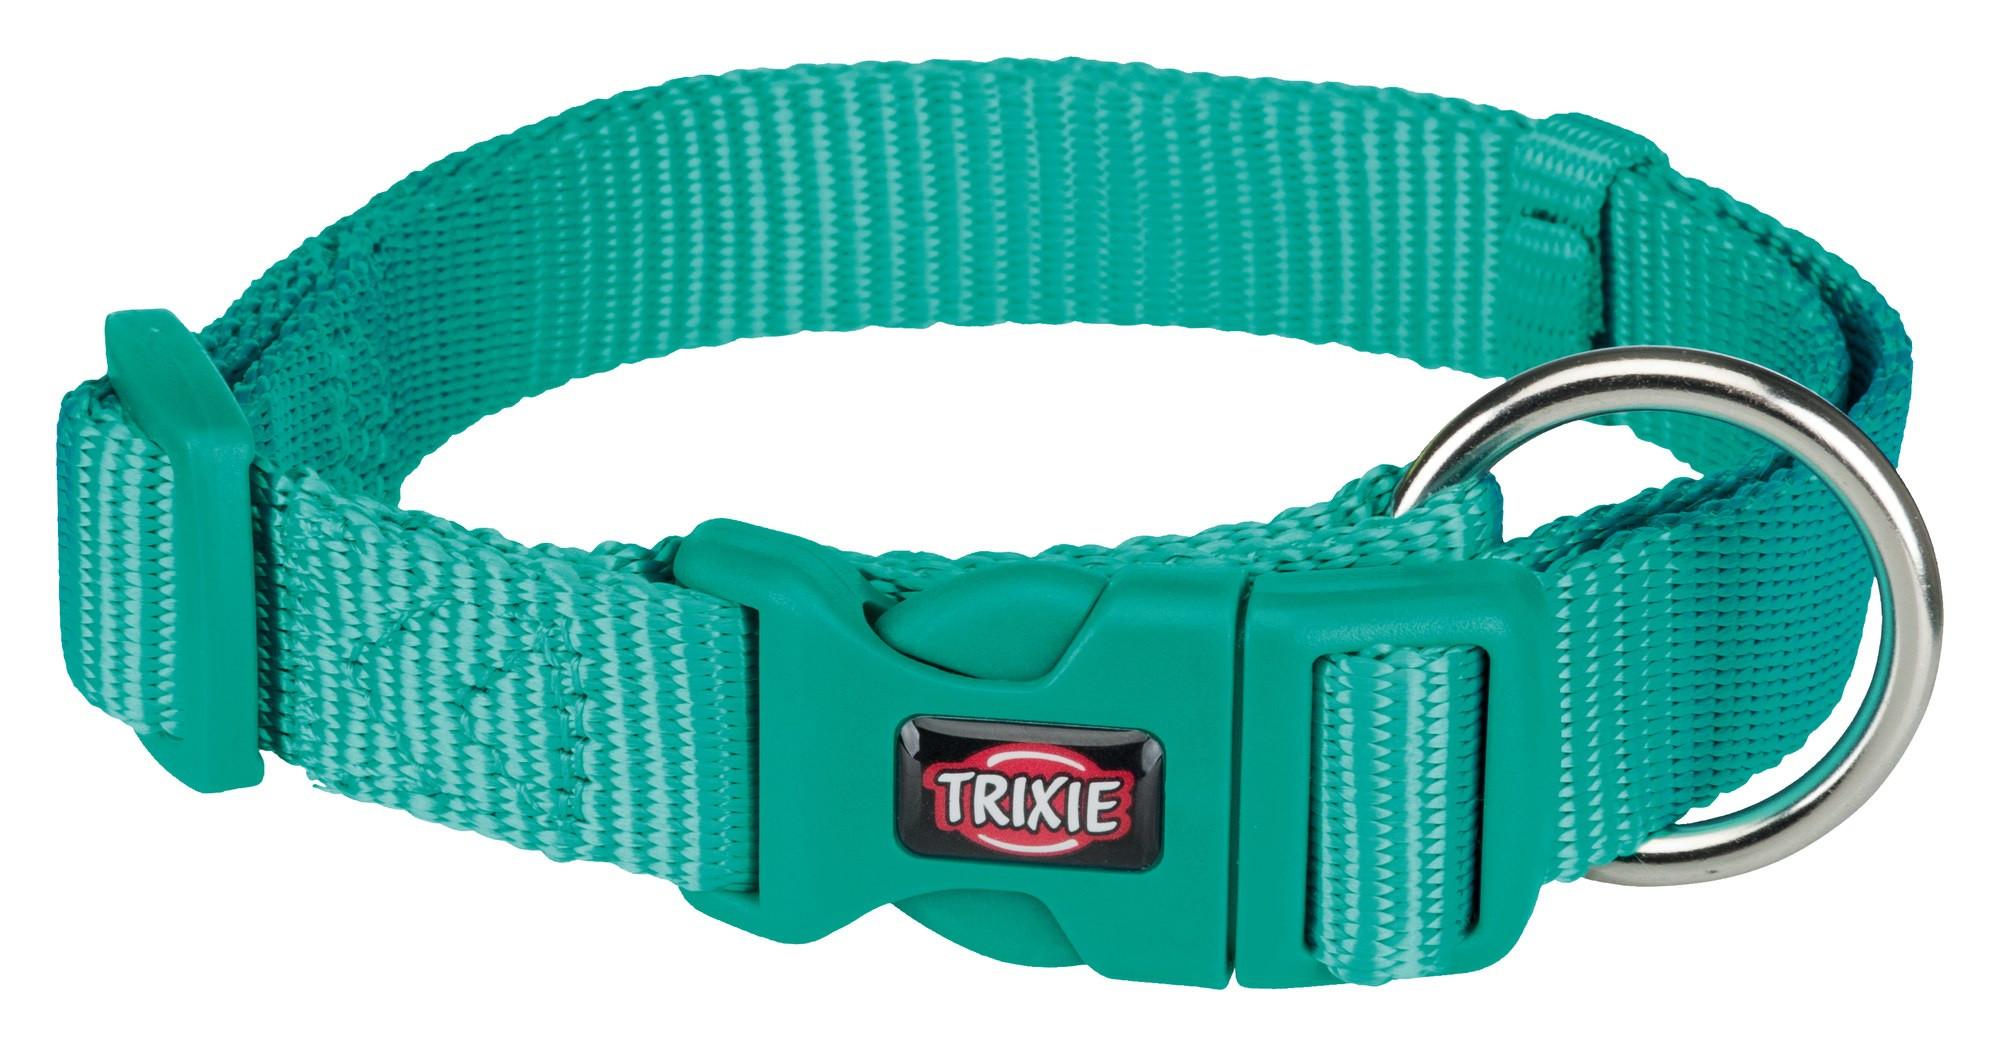 Ошейник для собак TRIXIE Premium, океан, XXS–XS, 15–25 см, 10 мм